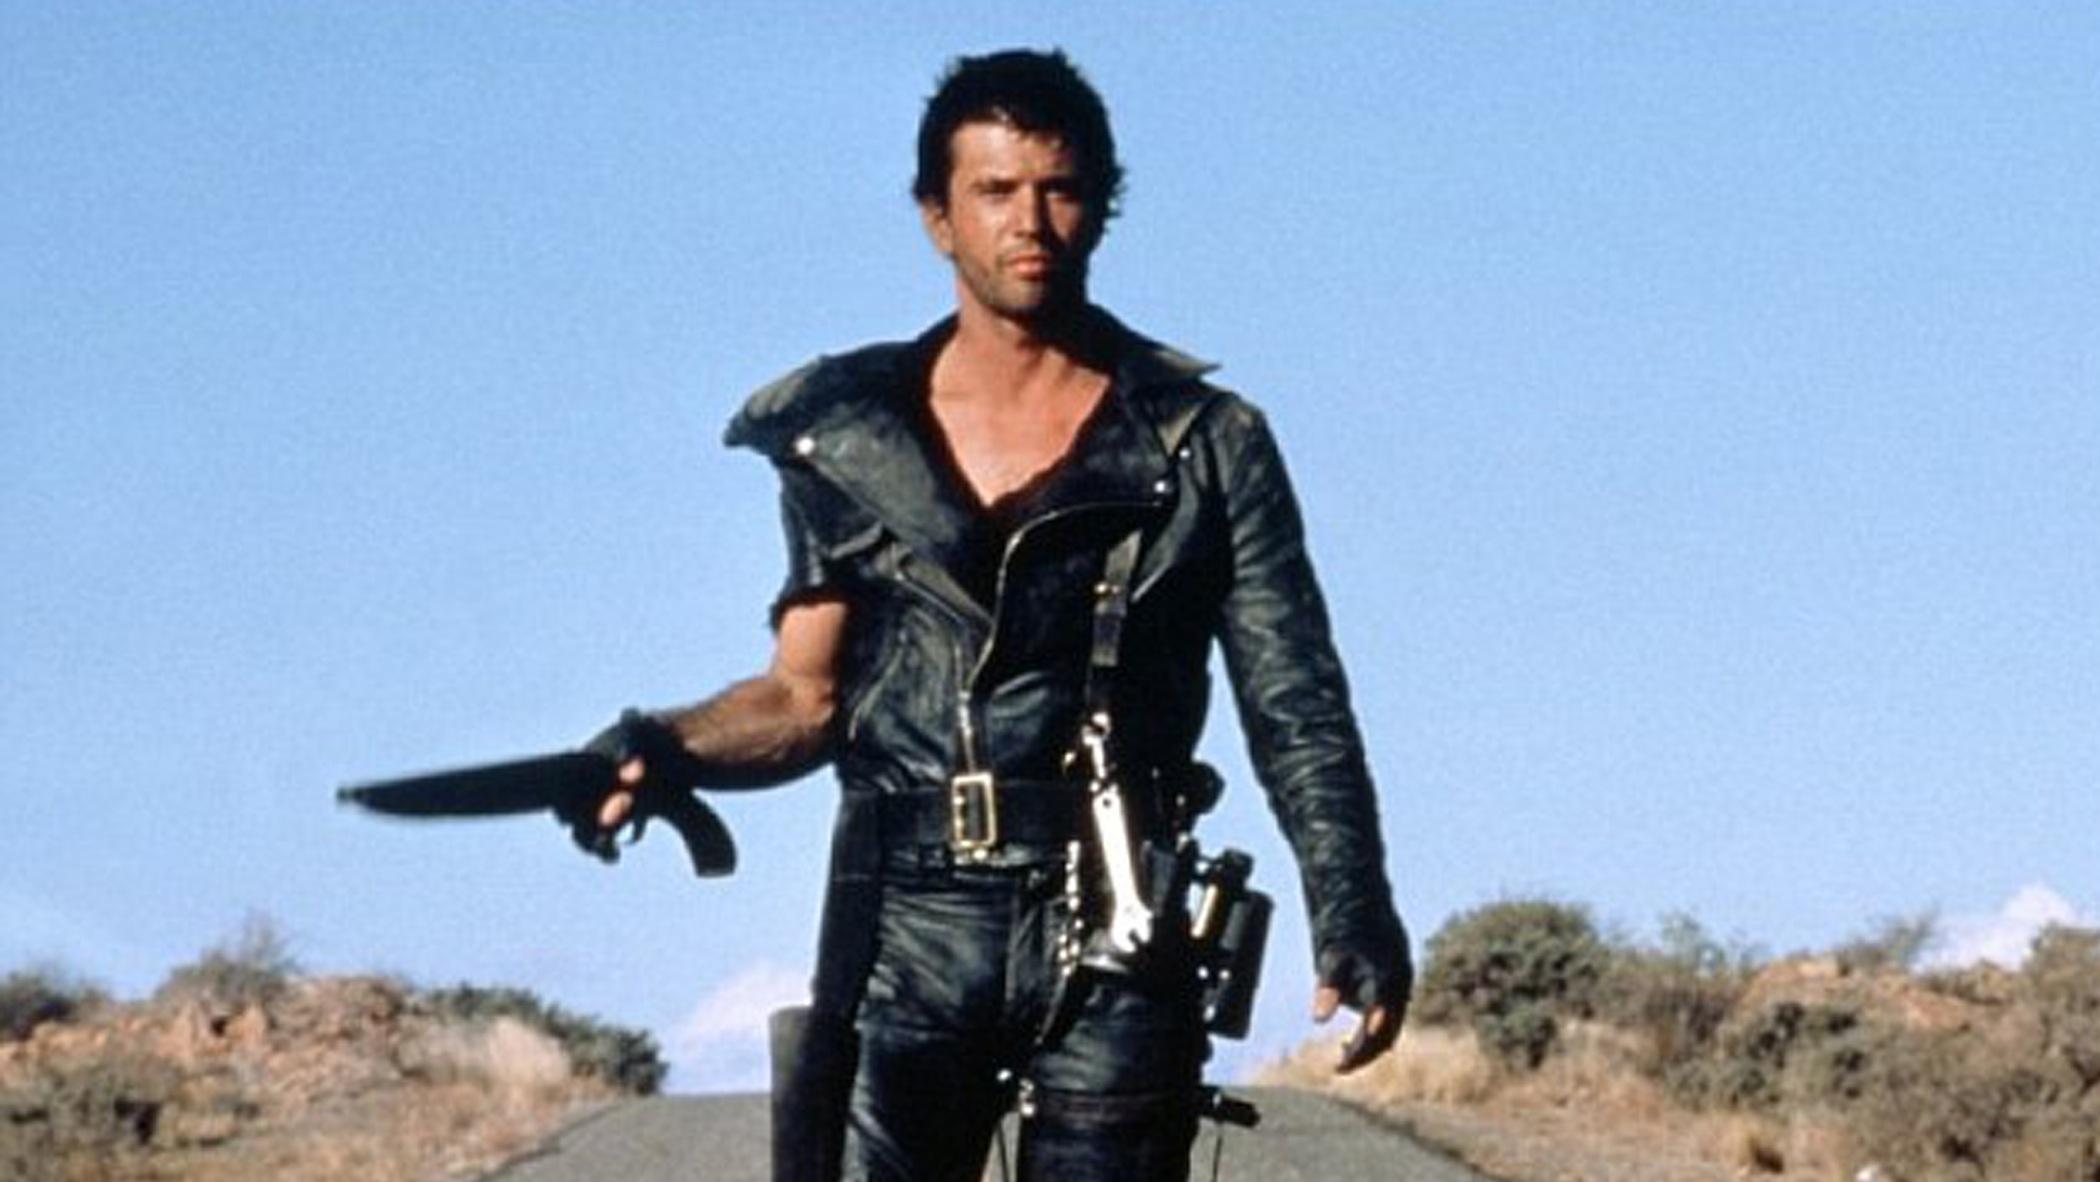 Max Rockatansky (Mel Gibson) with his gun